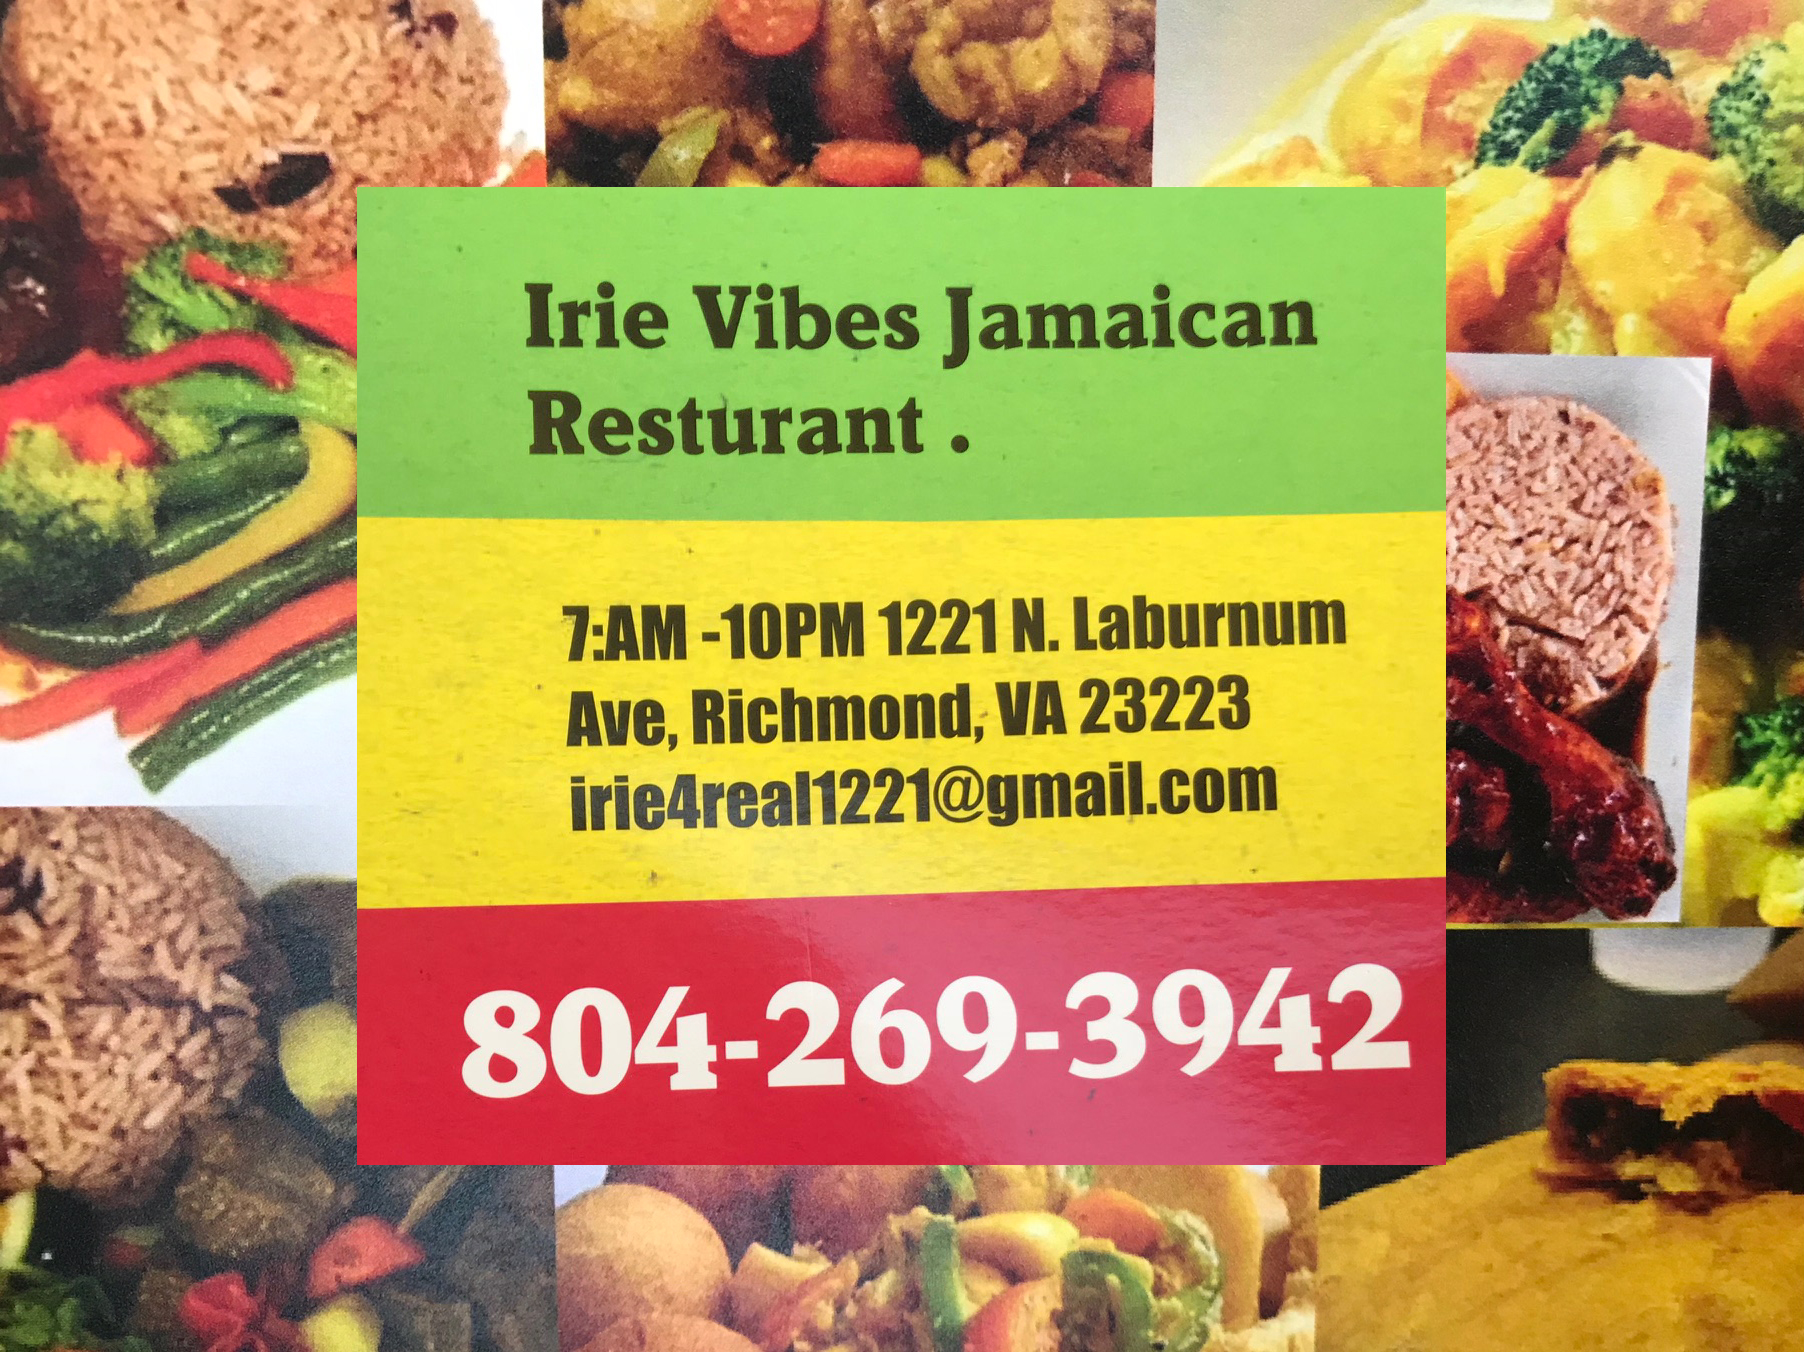 Irie Vibes Jamaican Restaurant